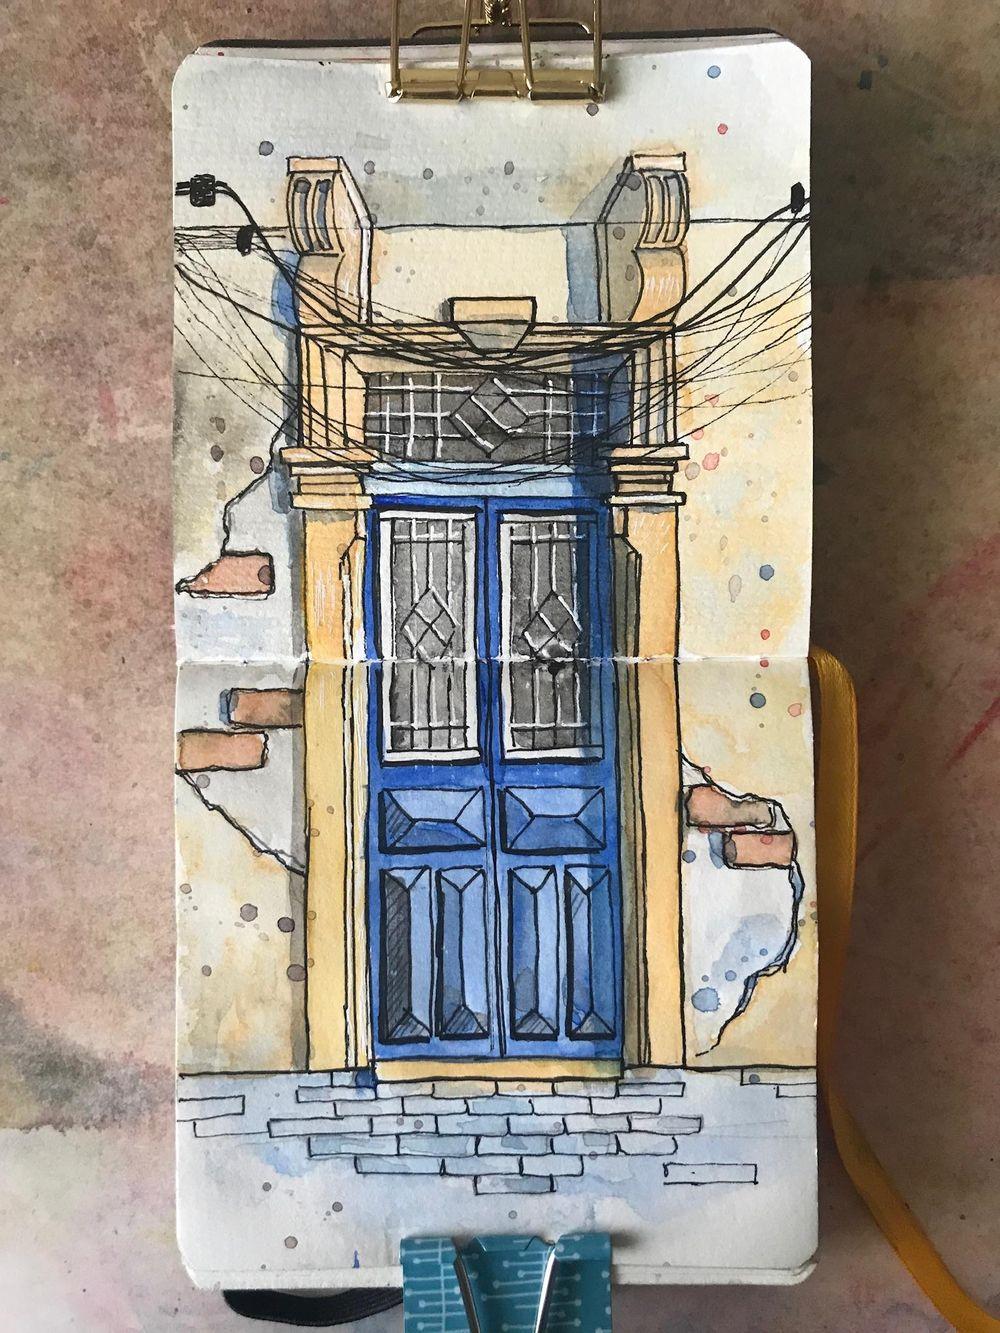 A few doors - image 2 - student project